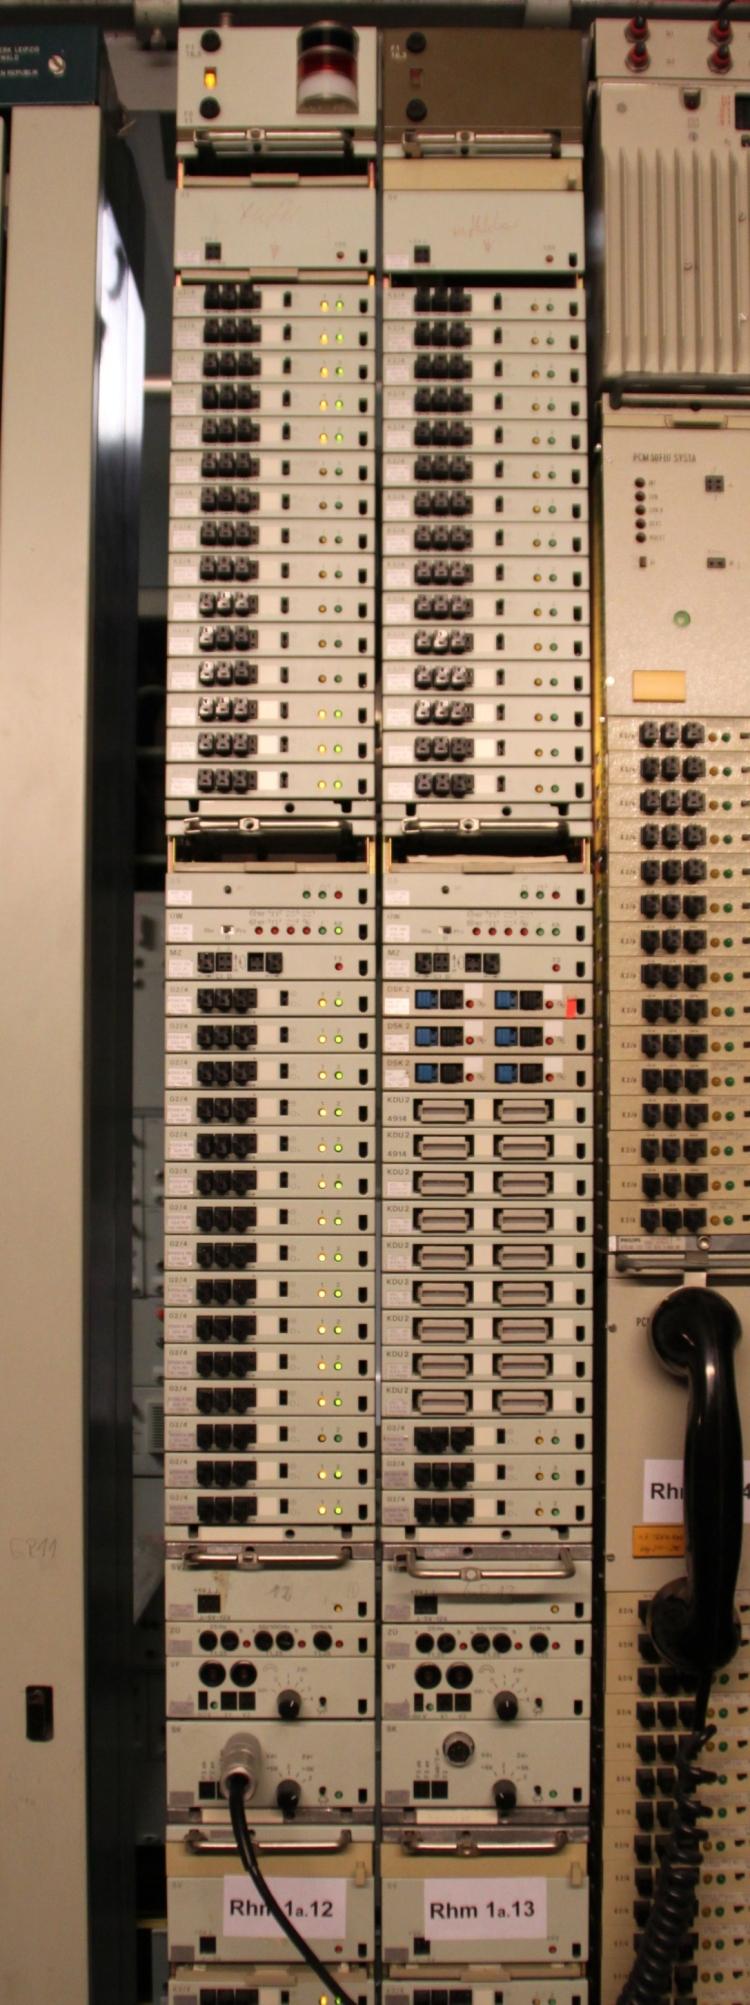 PCM 30 Siemens